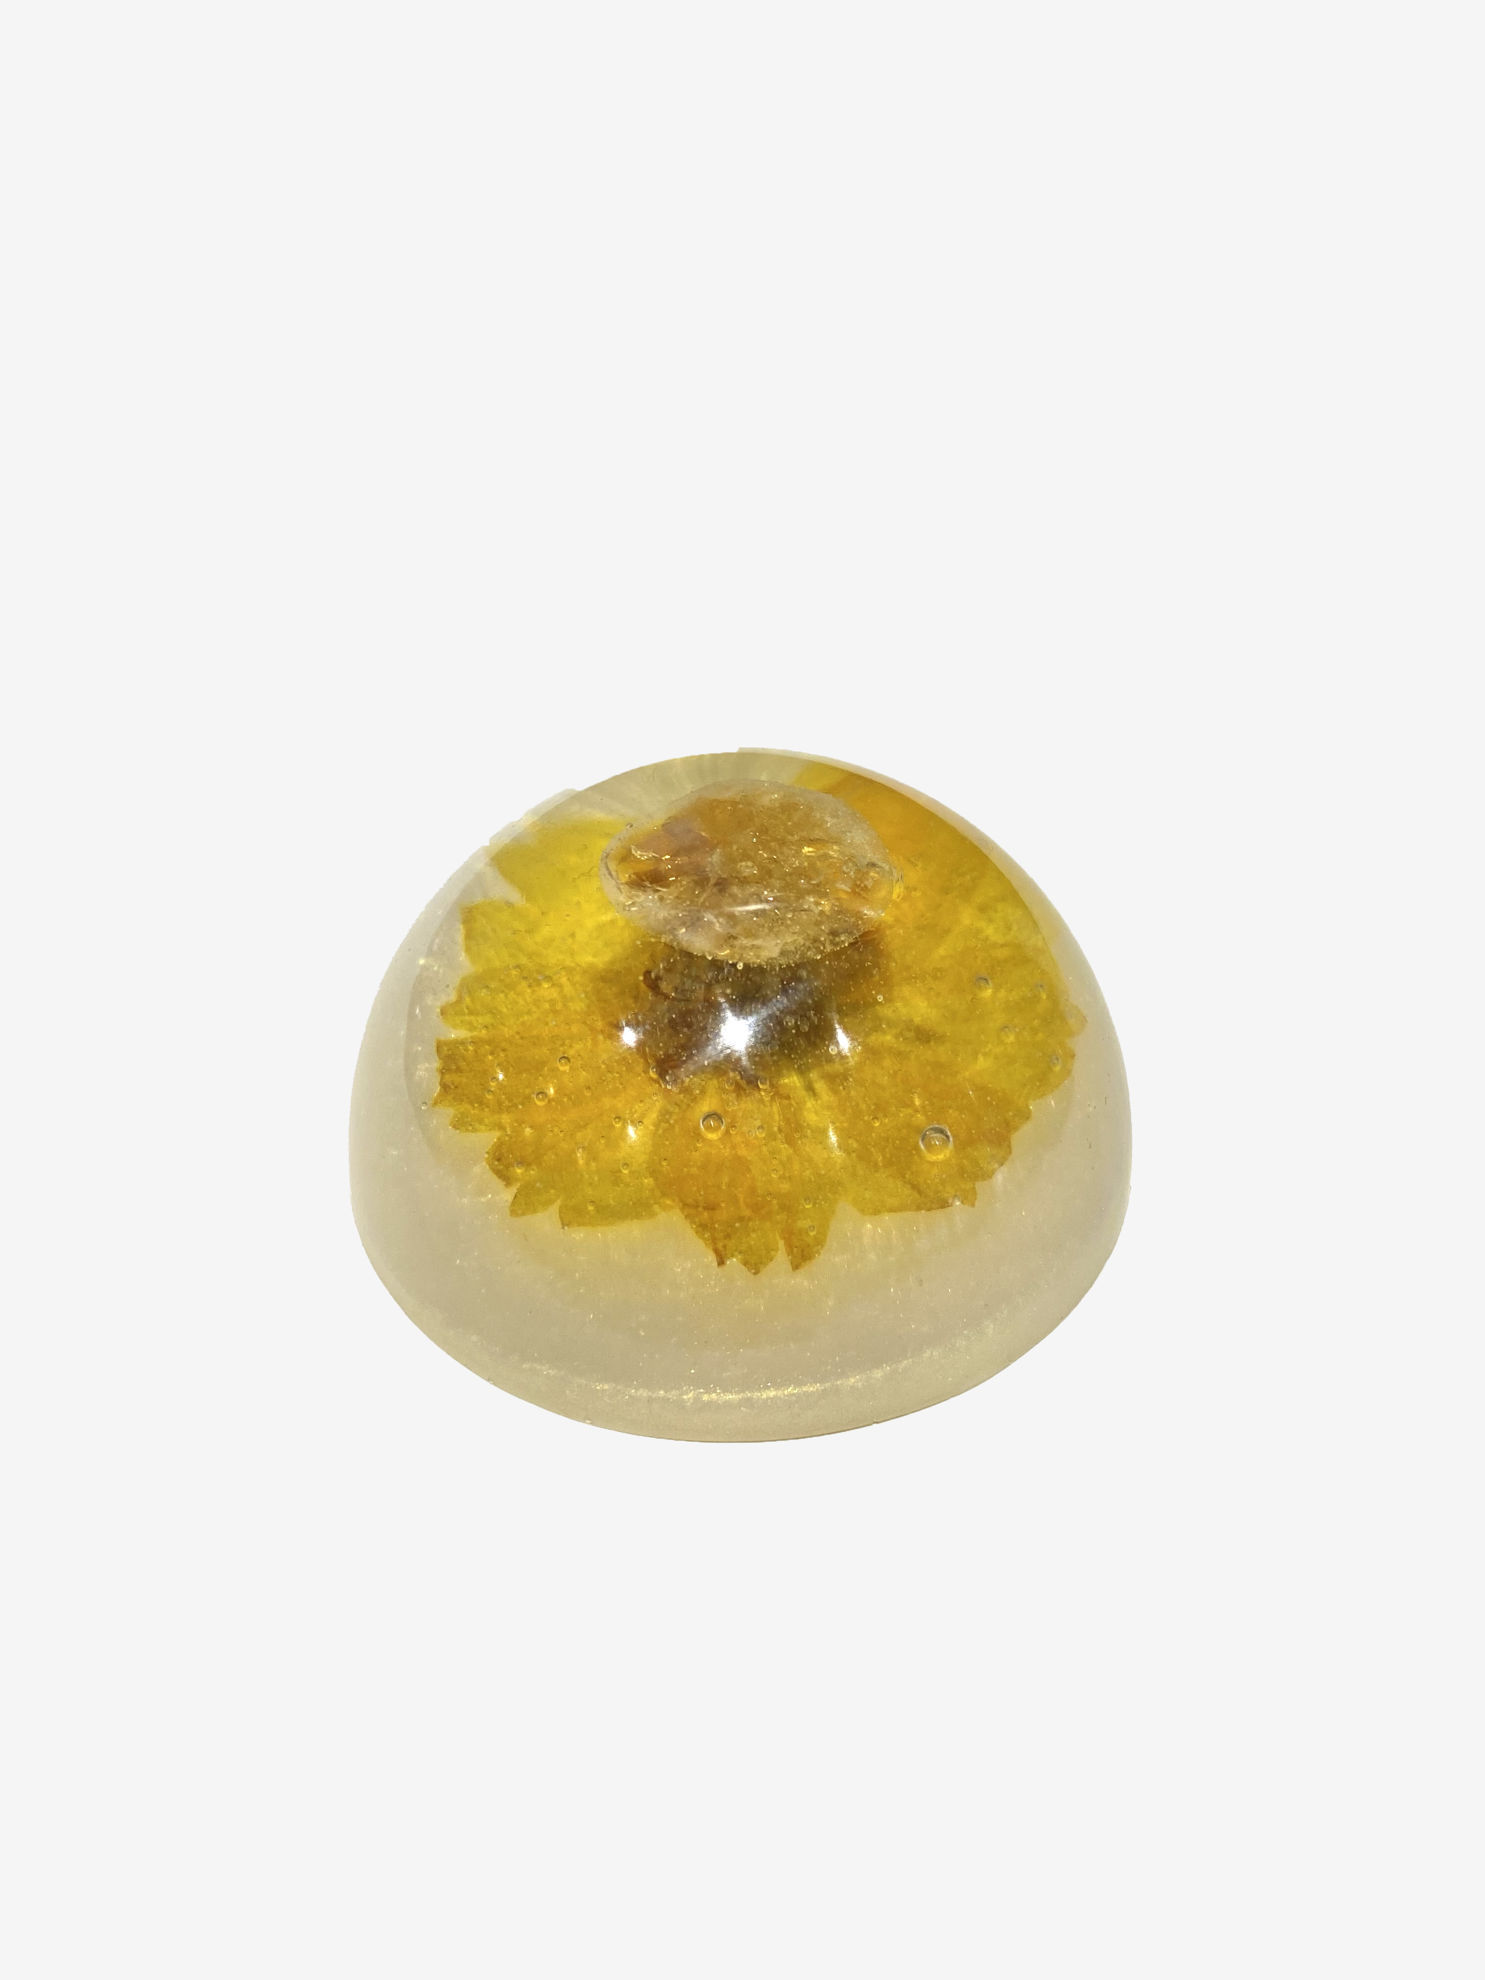 Gold Gem & Yellow Flower Paperweight by Spirited Pyramids